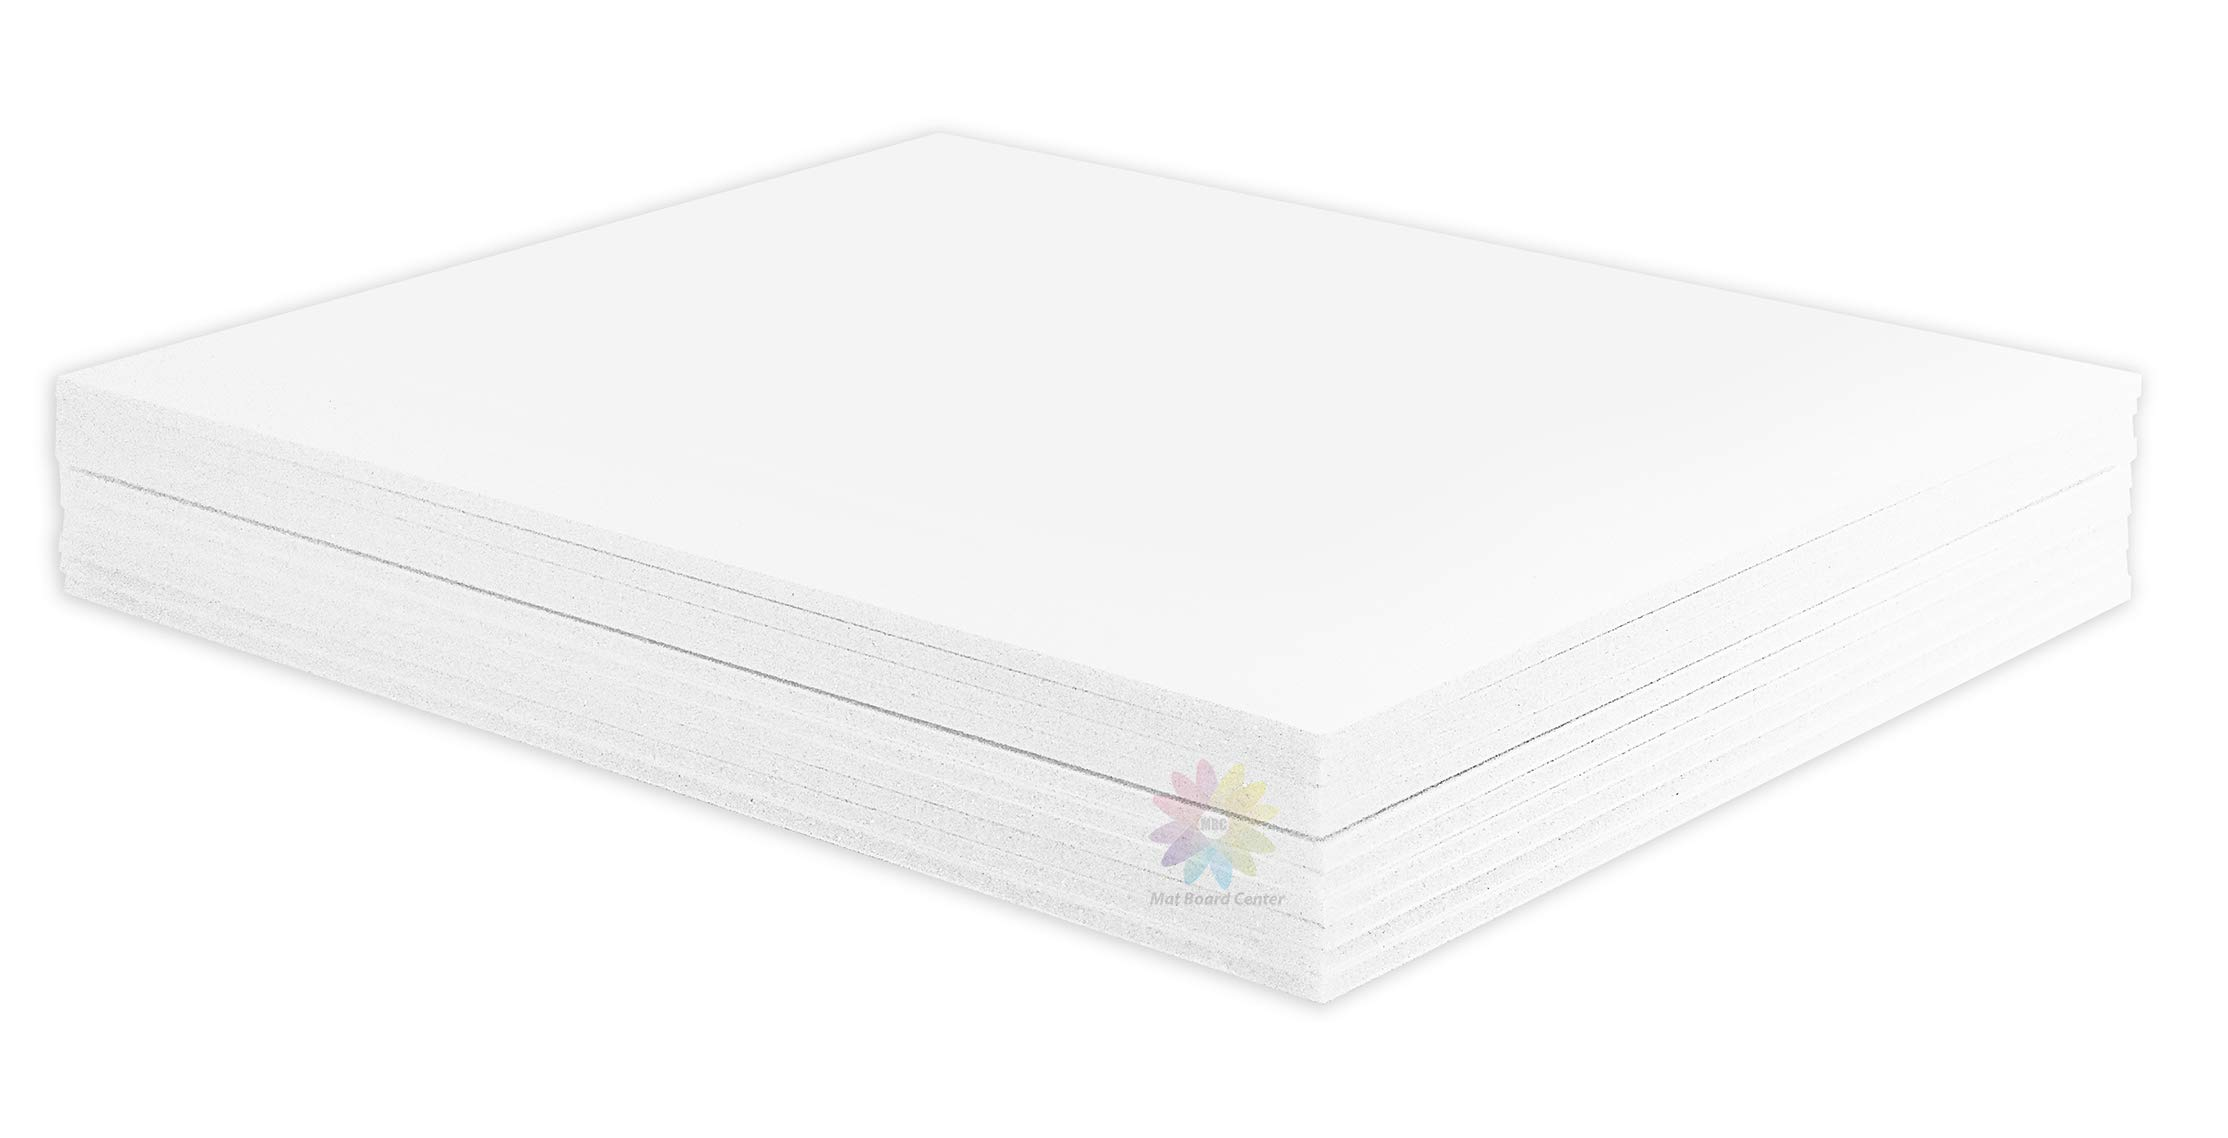 Mat Board Center, Pack of 10 11x14 1/8'' White Foam Core Backing Boards by MBC MAT BOARD CENTER